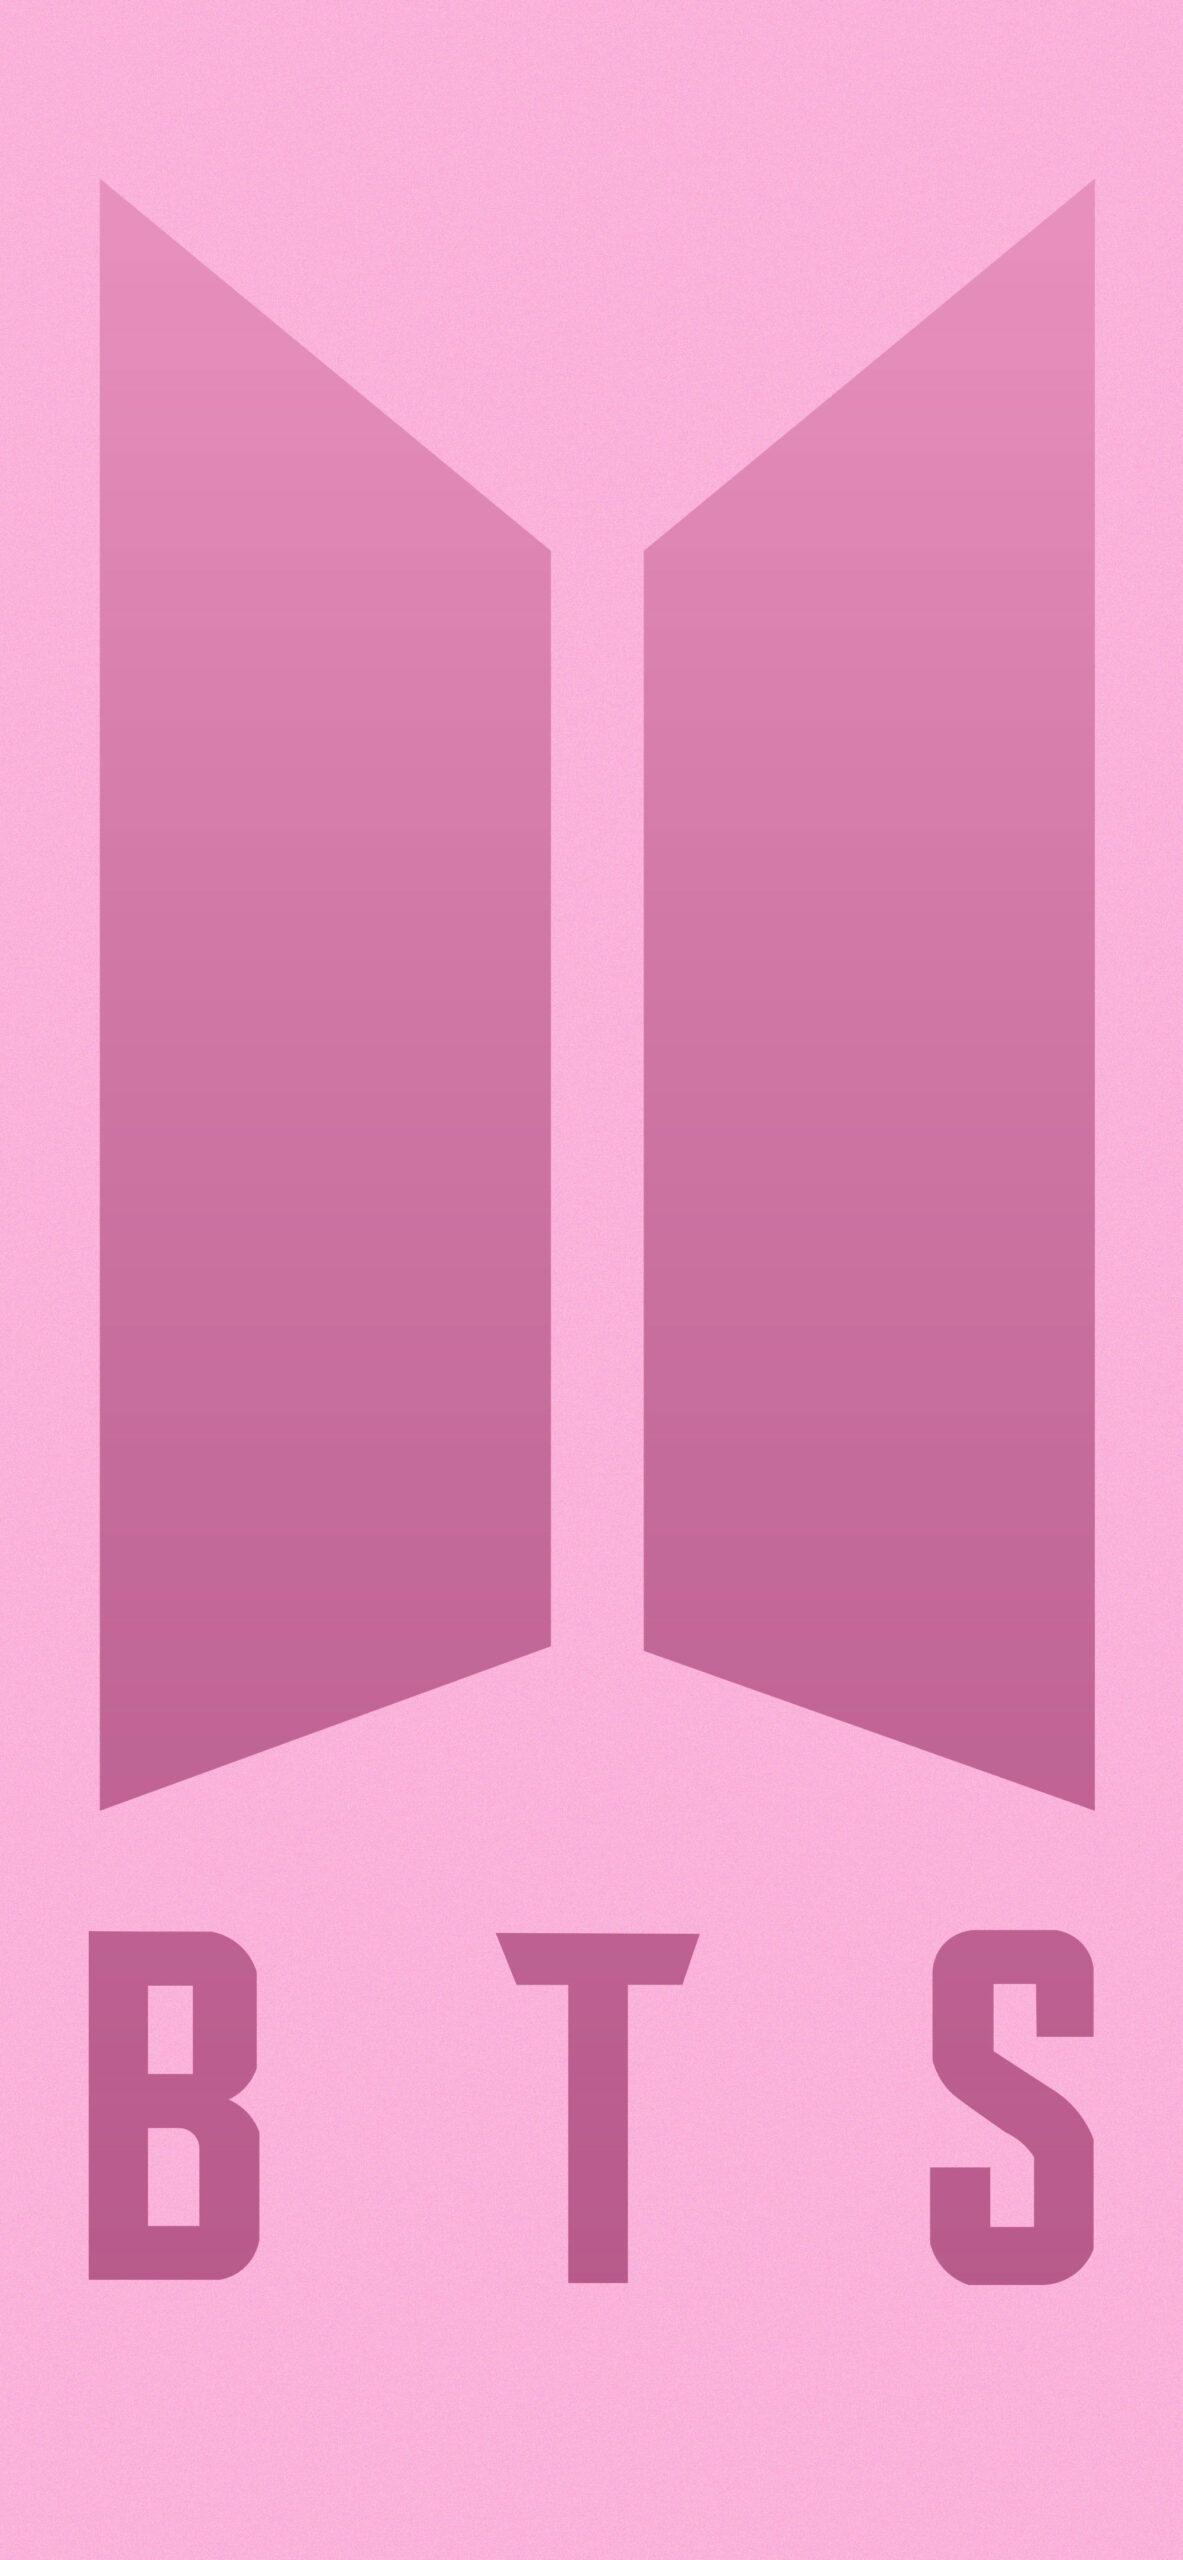 bts bt21 cooky pink background